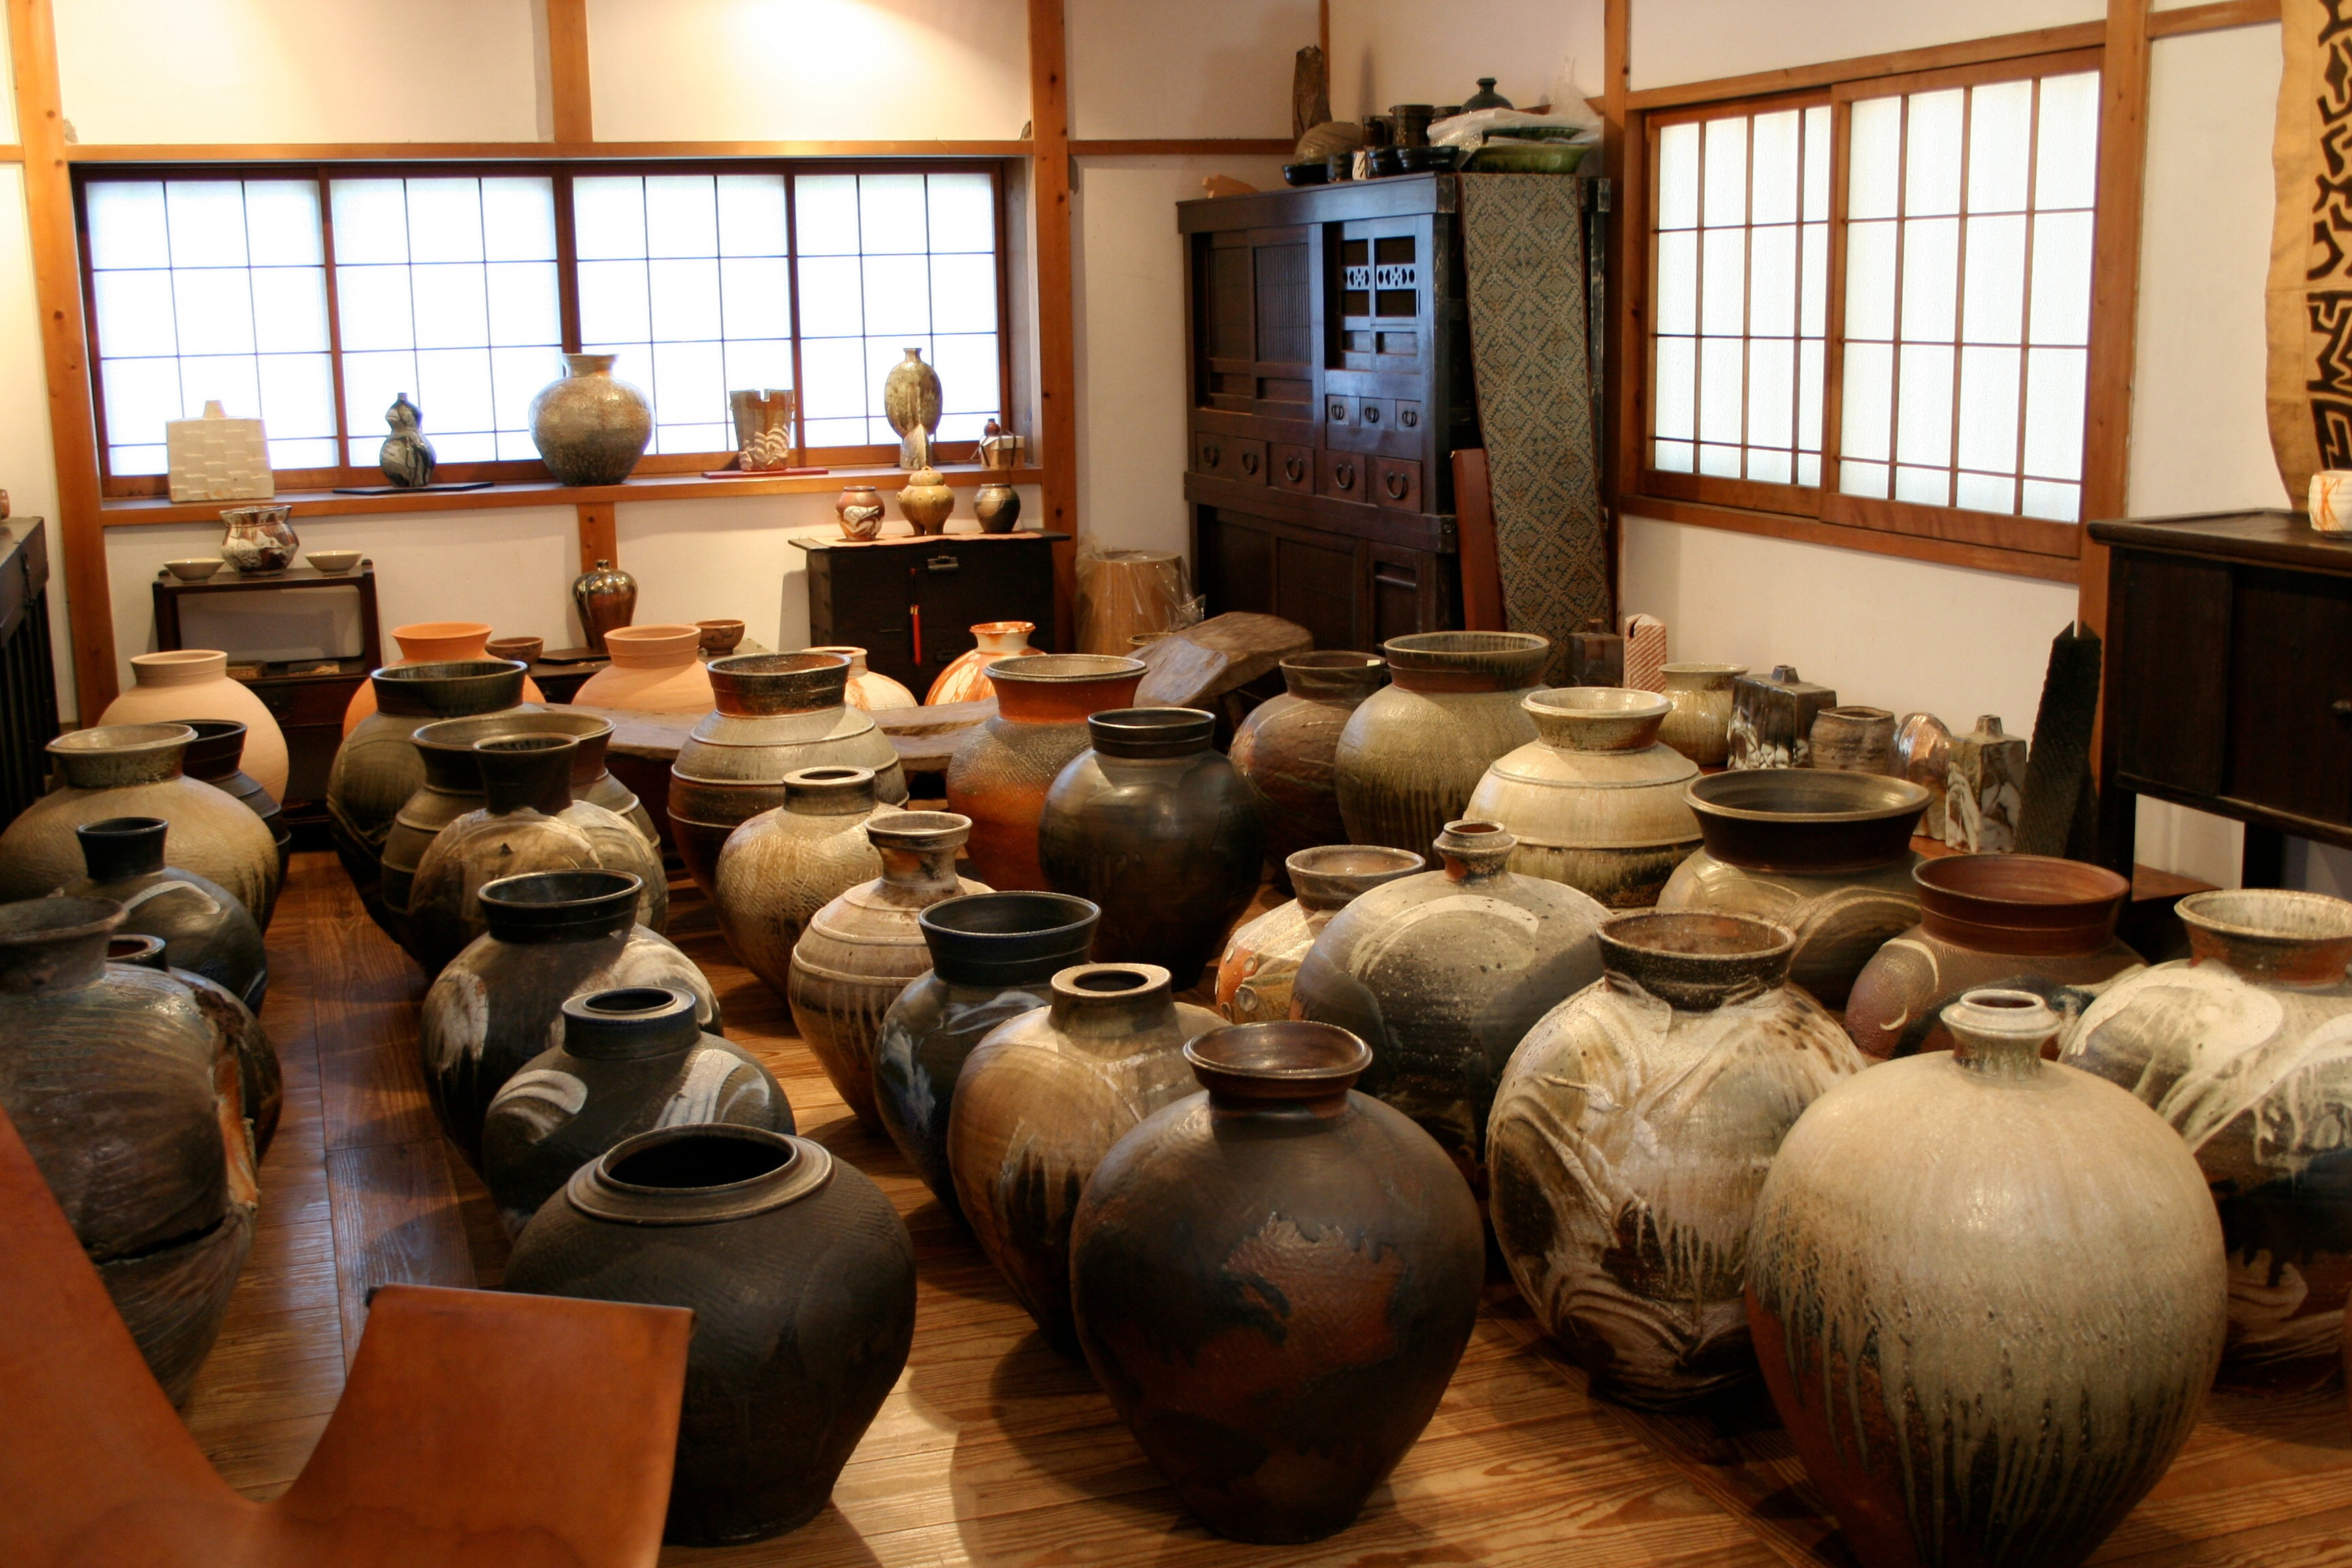 Anagama fired big pots, 2013